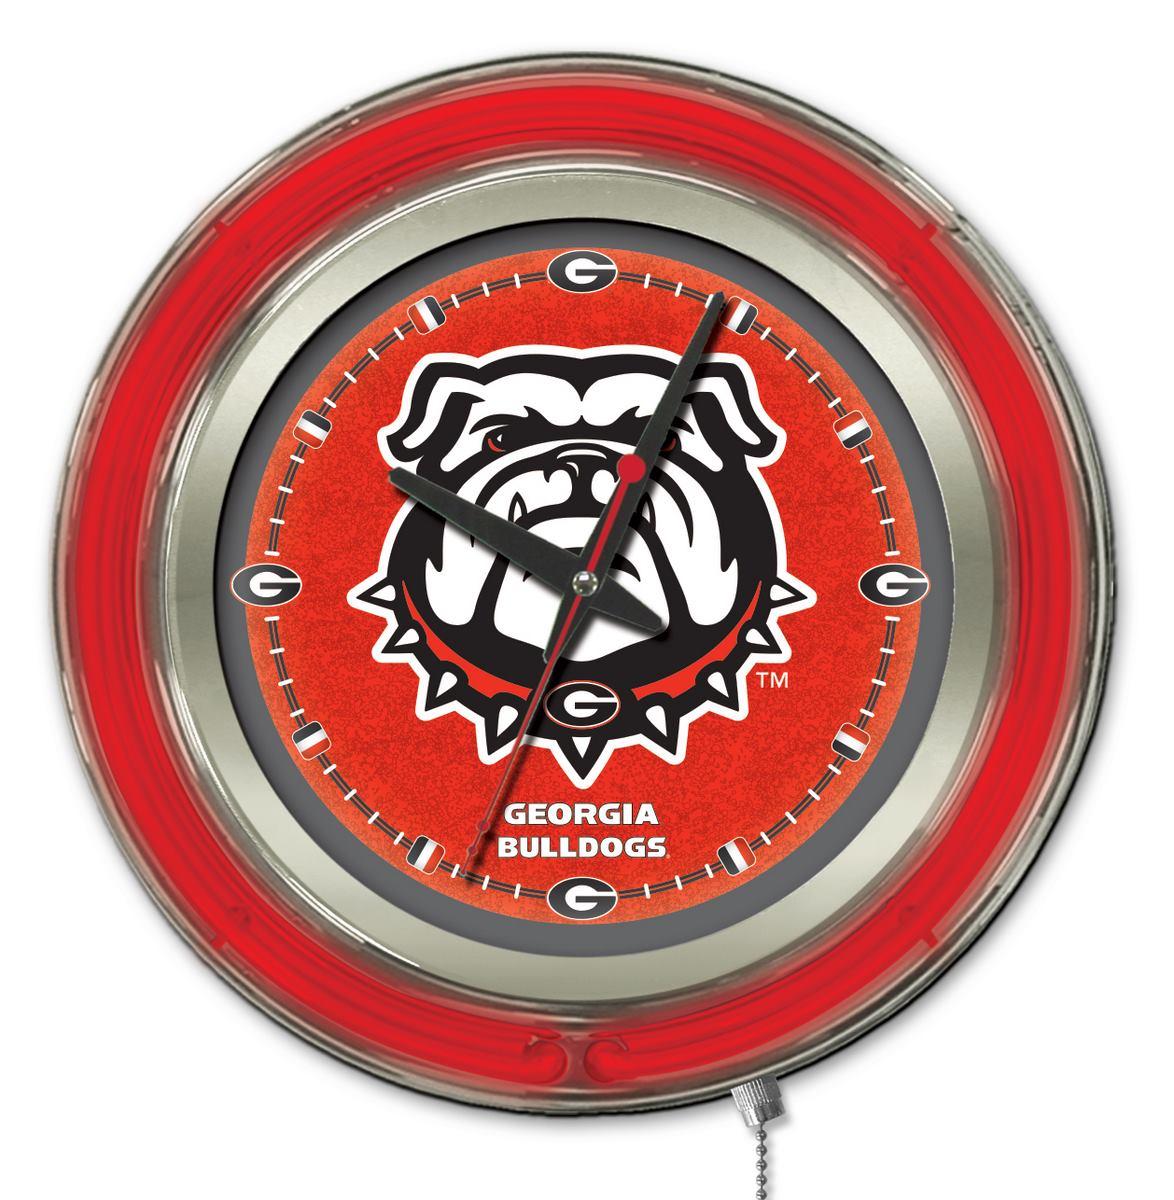 Georgia quotBulldogquot Double Neon Ring 15quot dia Logo Clock  : Clk15GA Dog from zerbee.com size 1174 x 1200 jpeg 171kB